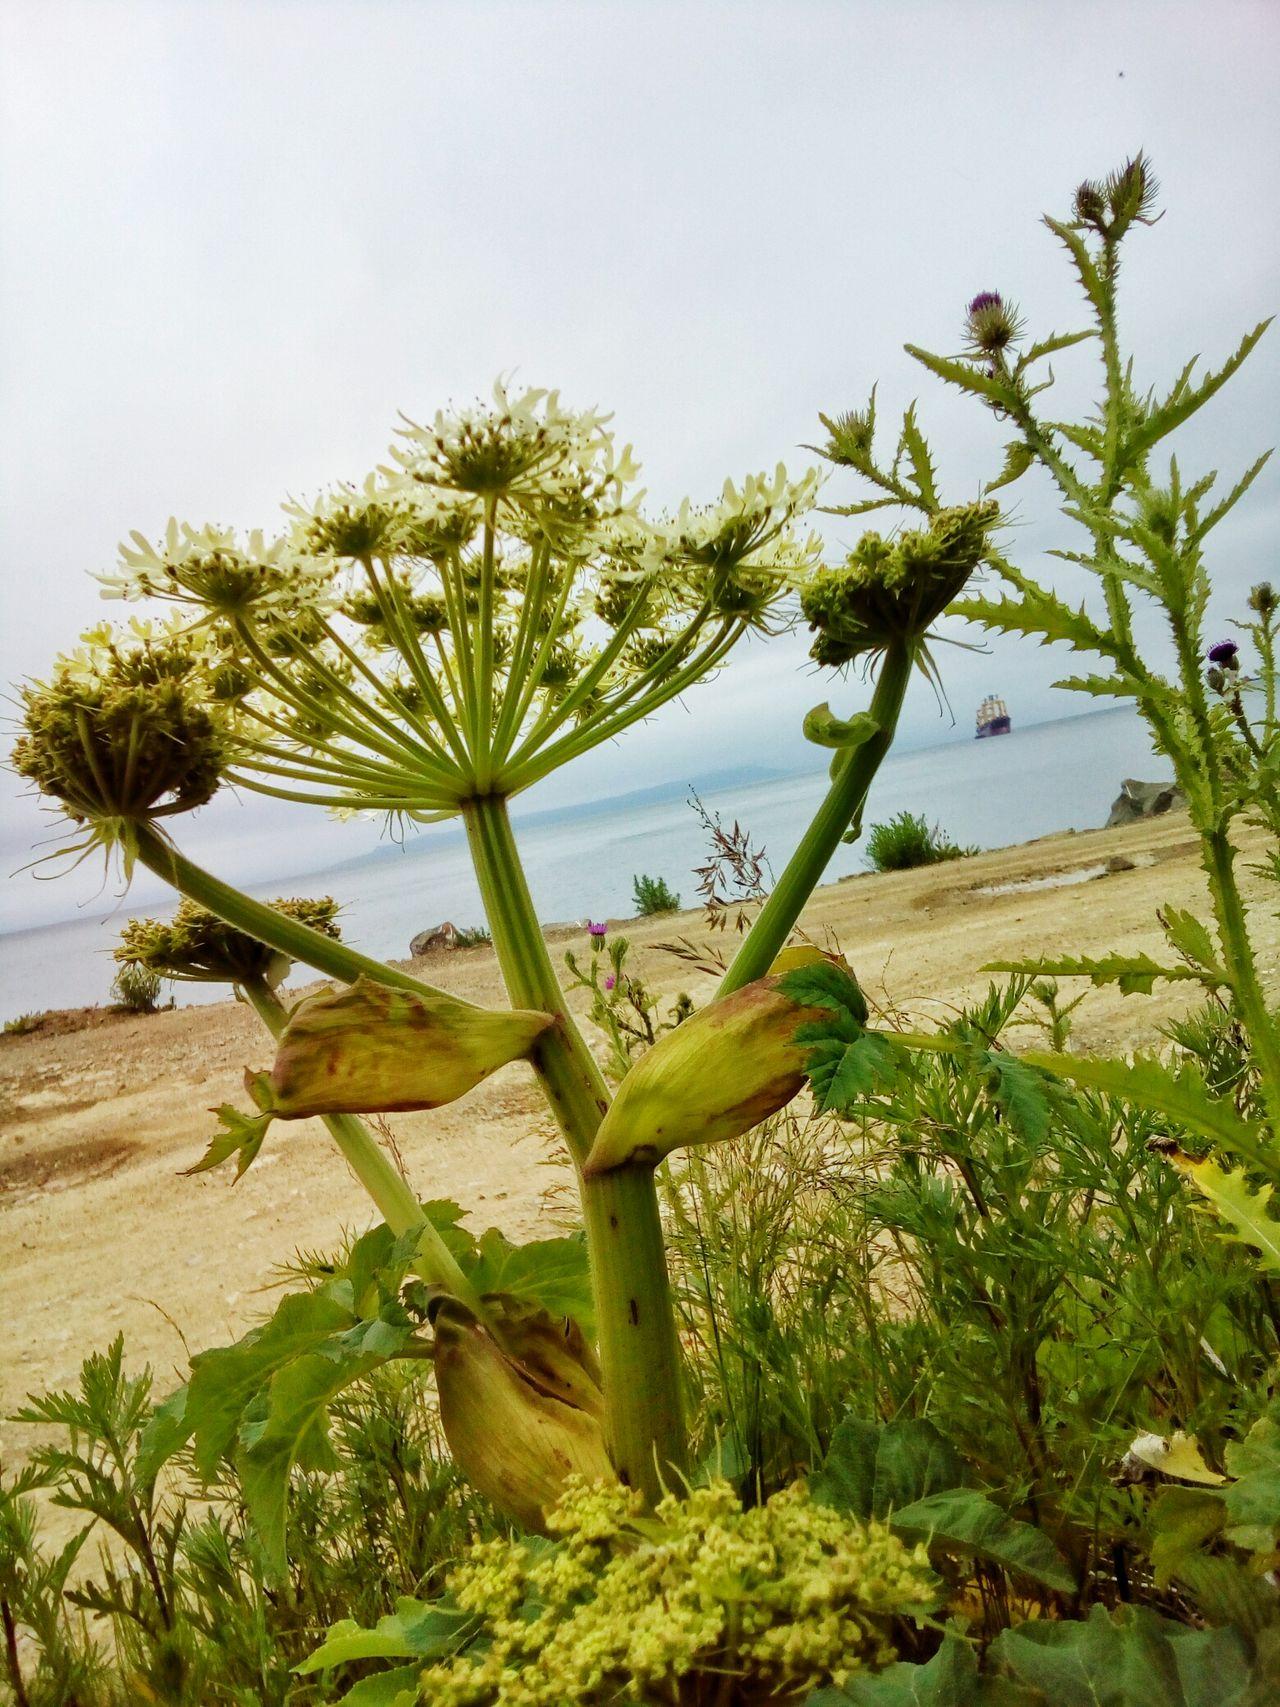 Fantastic plant Growth Plant Nature Day Outdoors Sky BIG Sea Beach Summer Heracleum Giganteum Heracleum Umbrella Apiaceae Umbelliferae Uncultivated Wild Flower